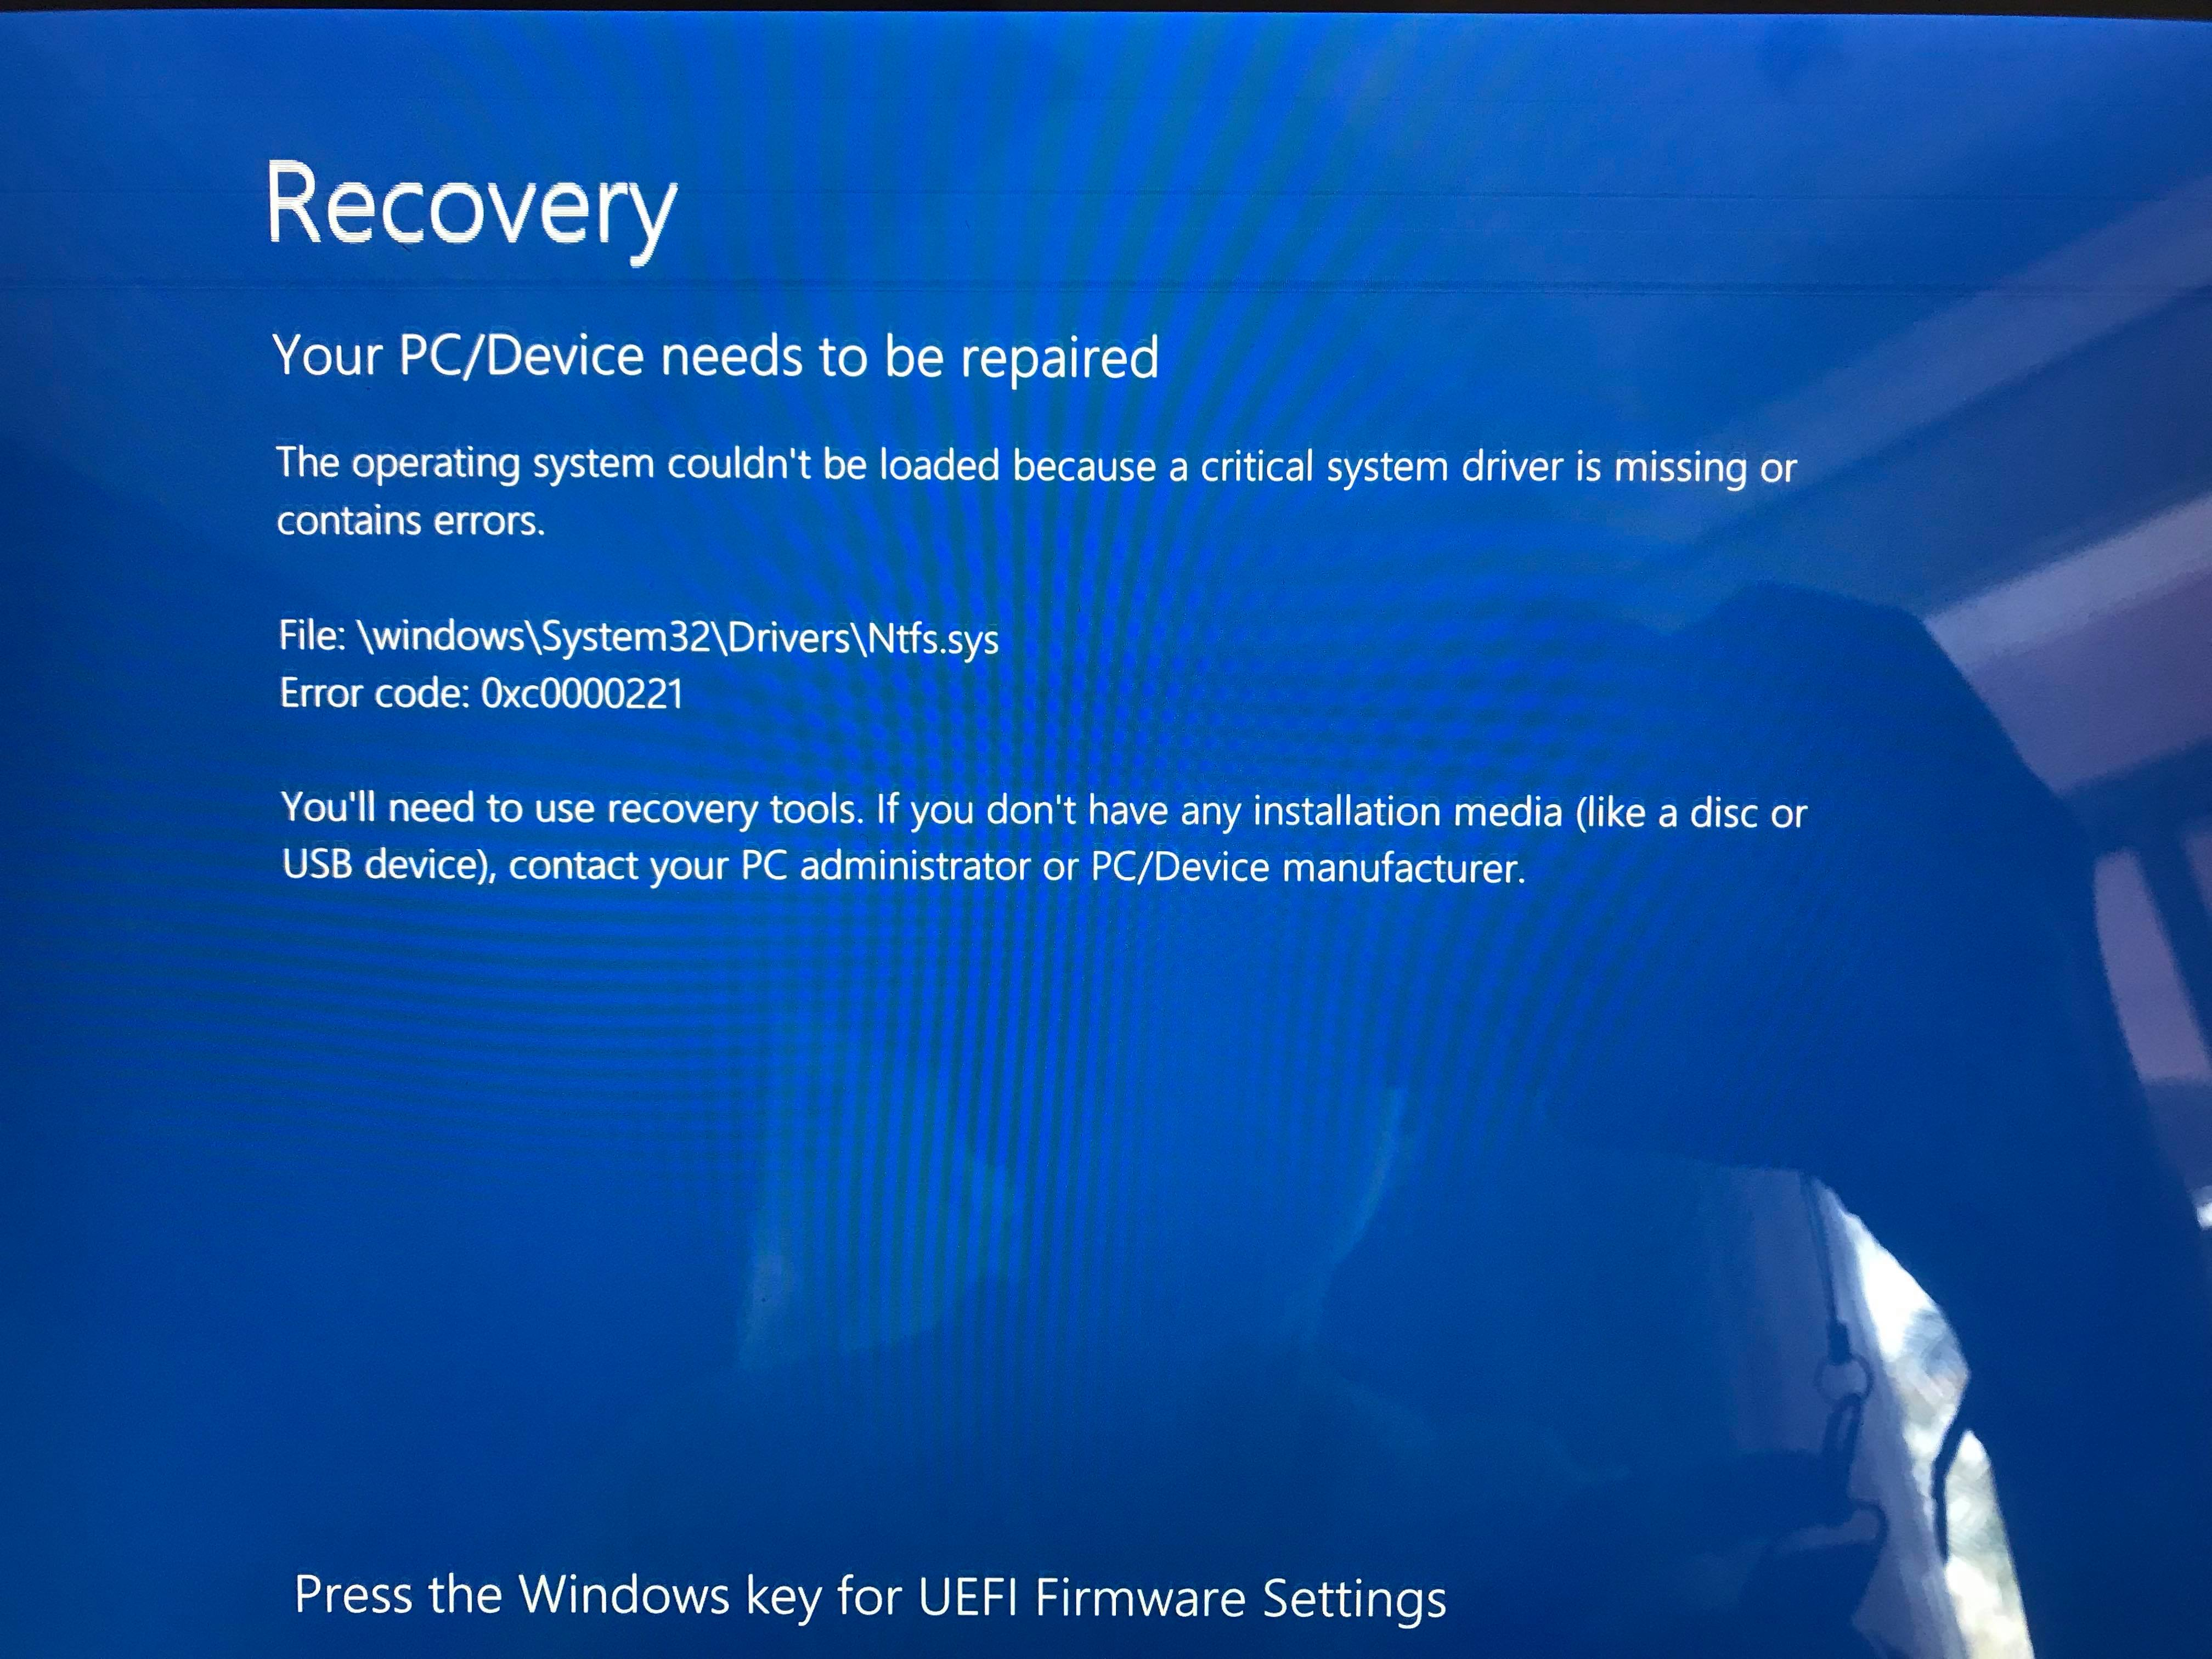 where do i get my flickering fix in Vietnam? - Microsoft Community